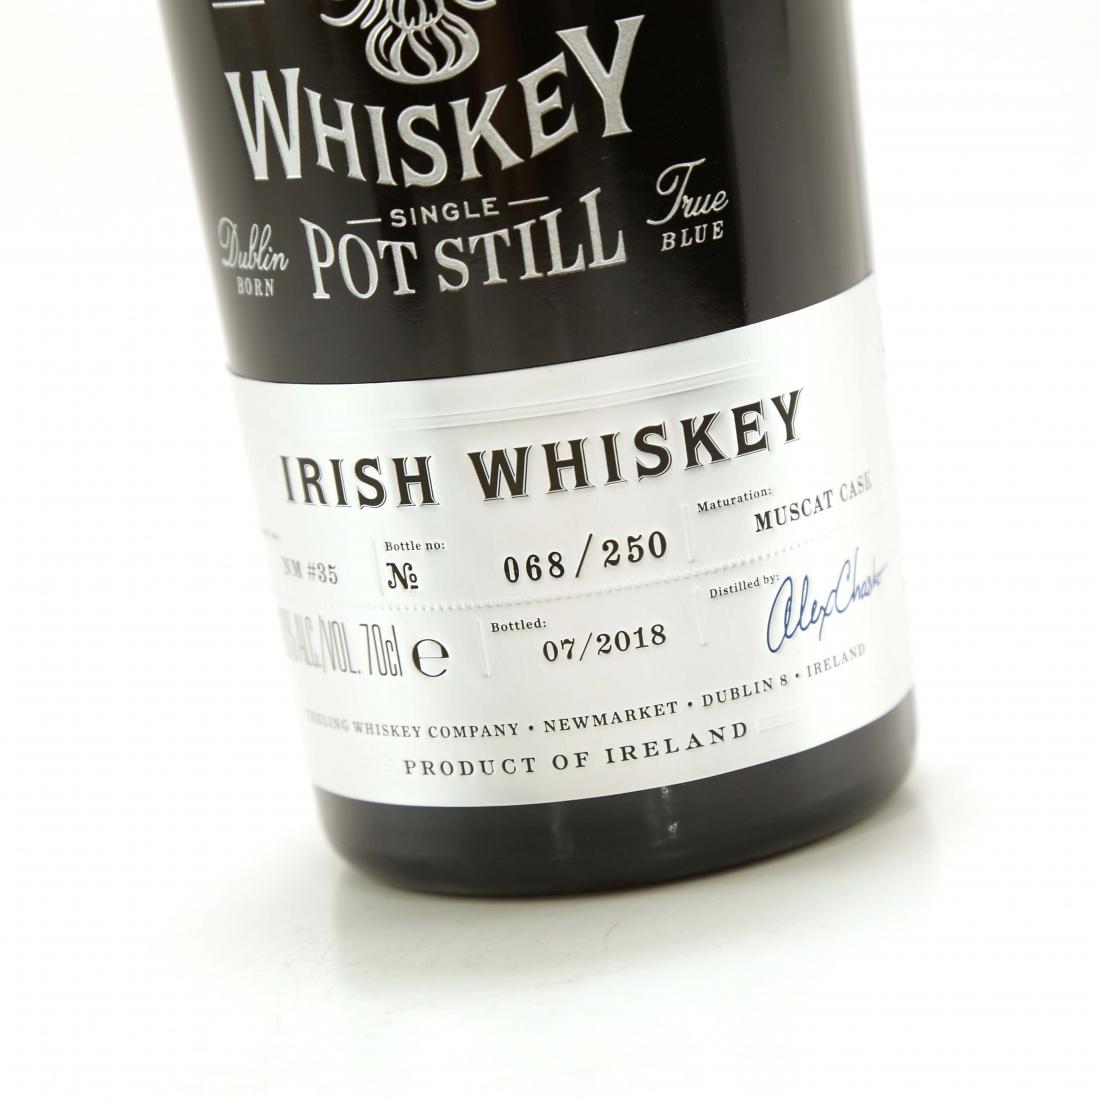 Teeling Celebratory Single Pot Still Whiskey / Bottle #068